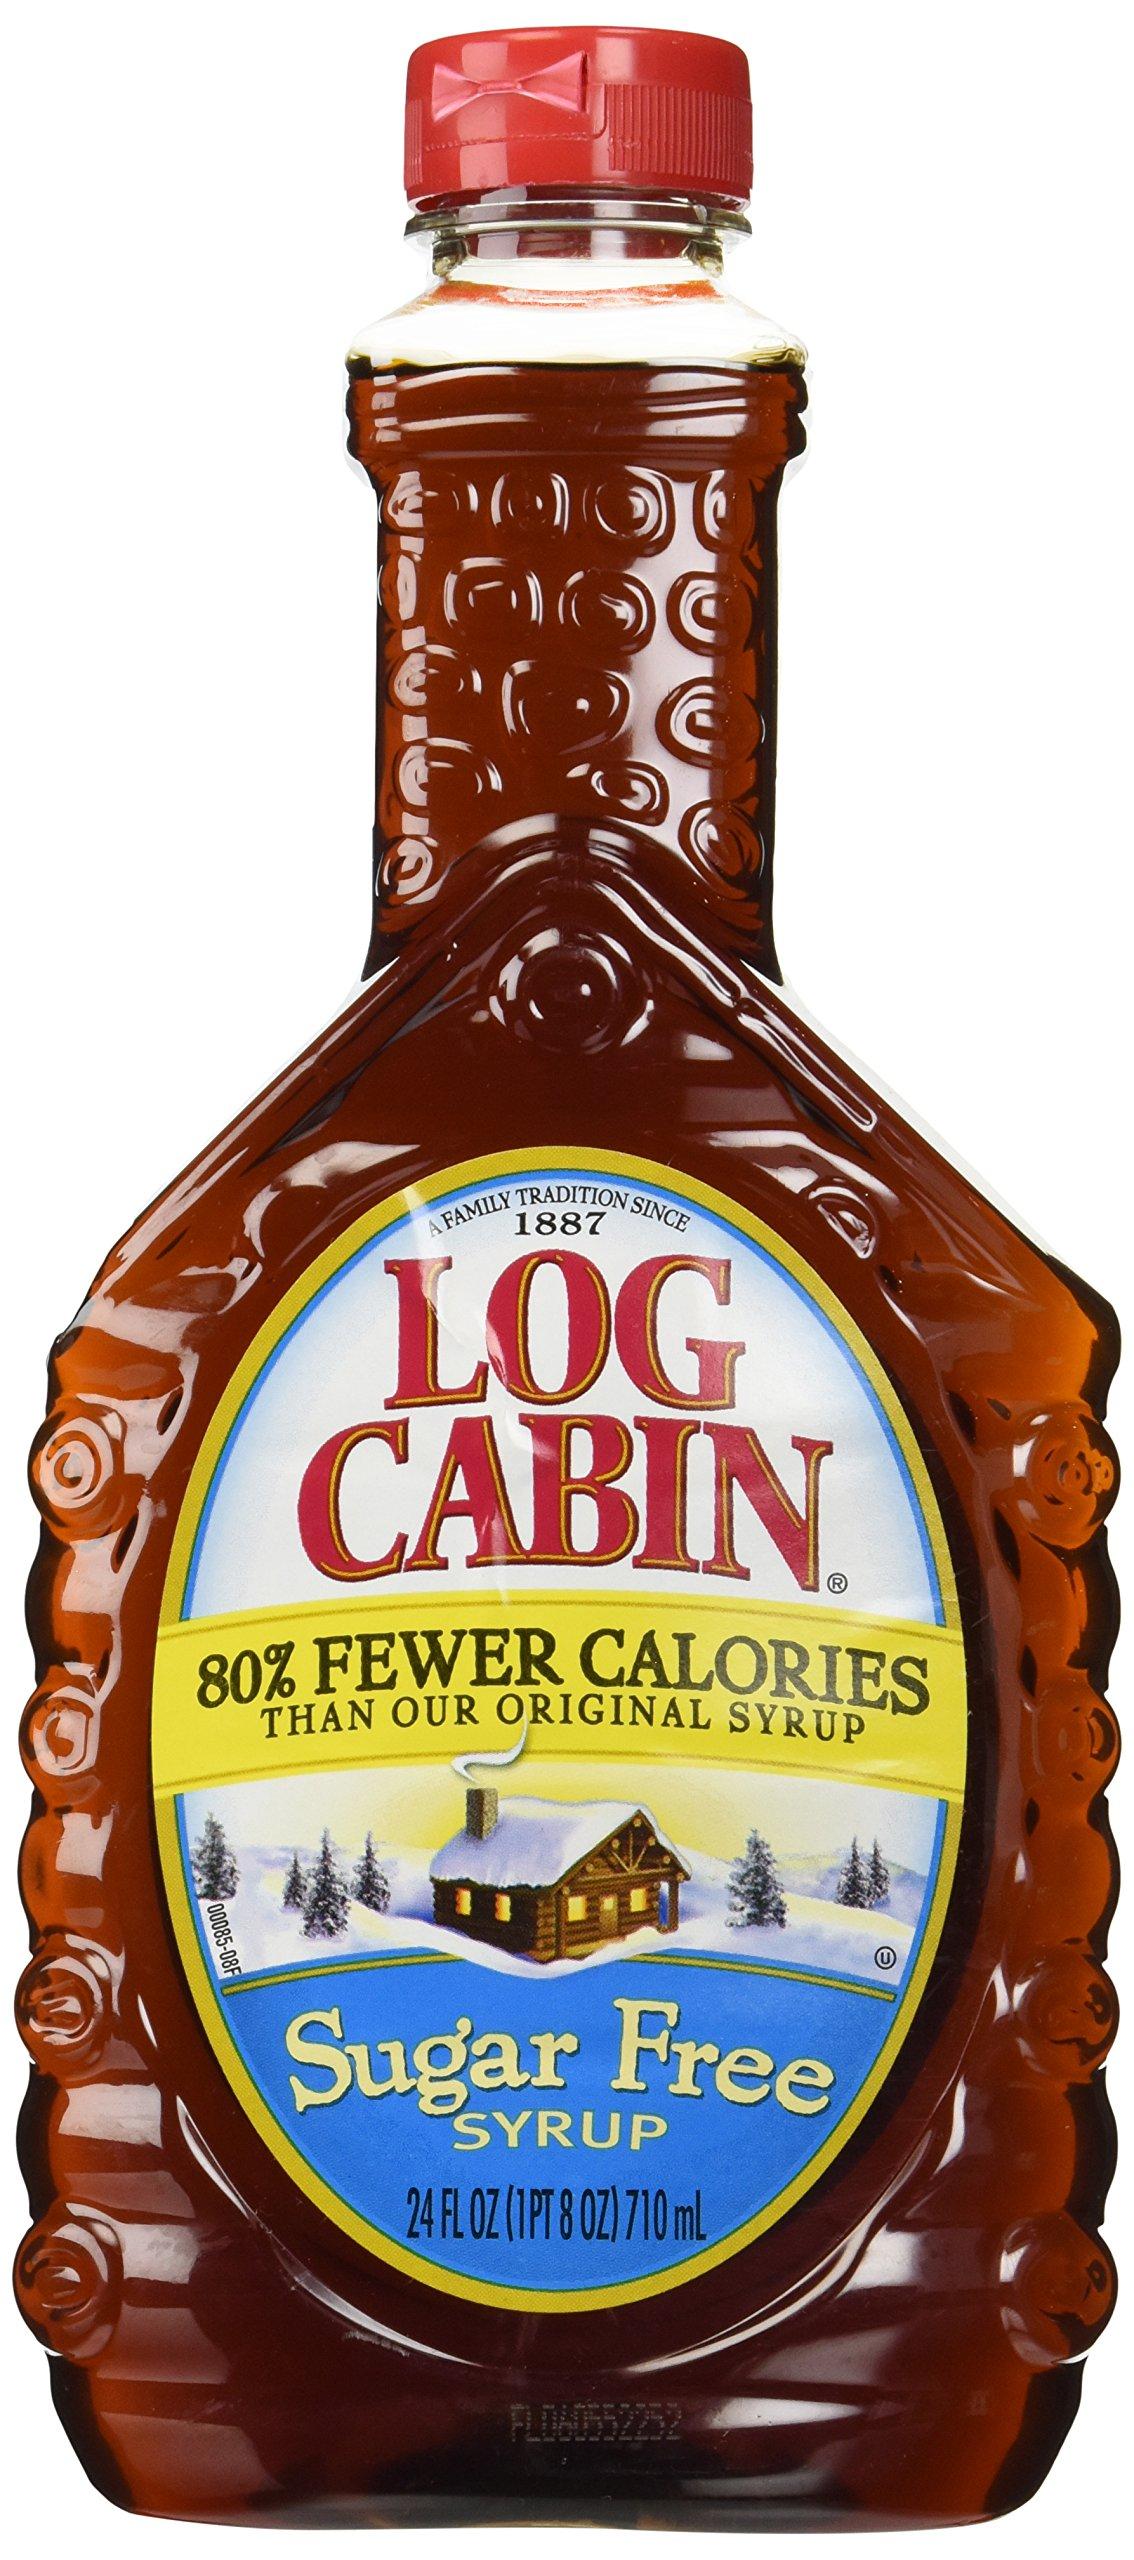 Log Cabin Sugar Free Syrup for Pancakes and Waffles, 24 oz.